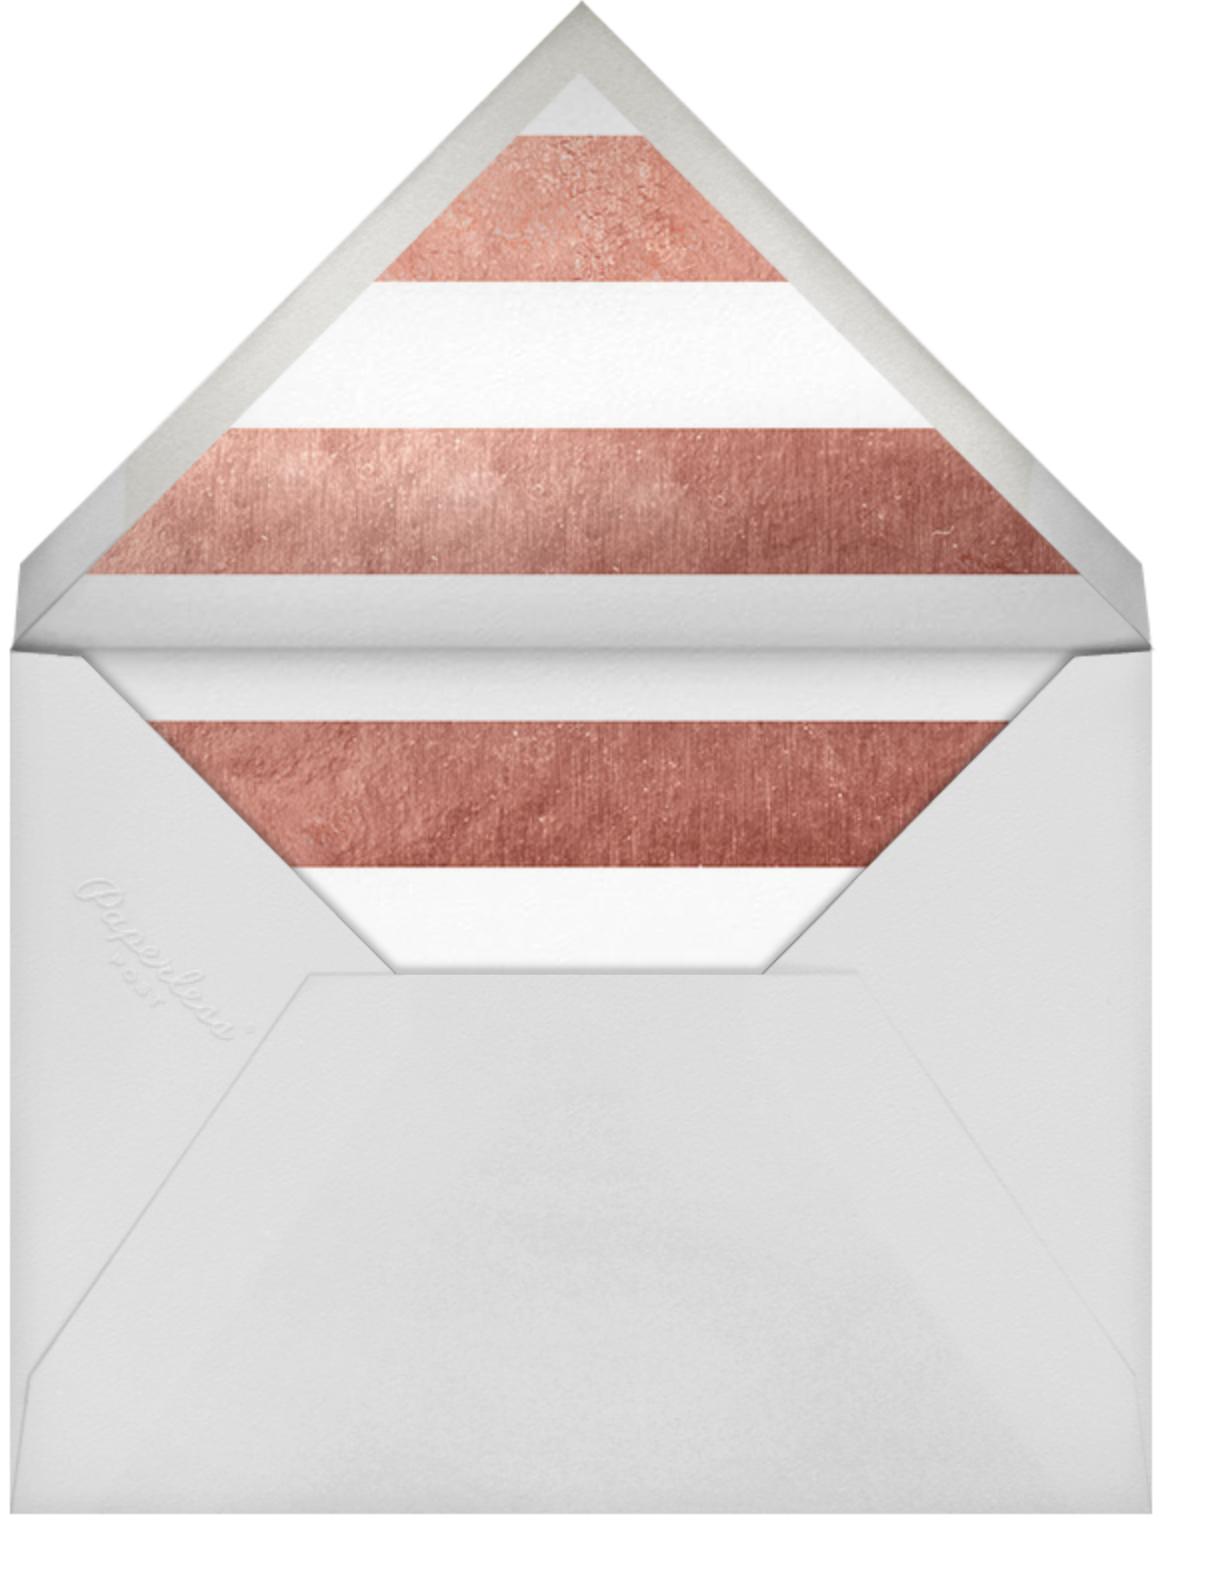 Big Dot Birthday - White/Rose Gold - Sugar Paper - Adult birthday - envelope back